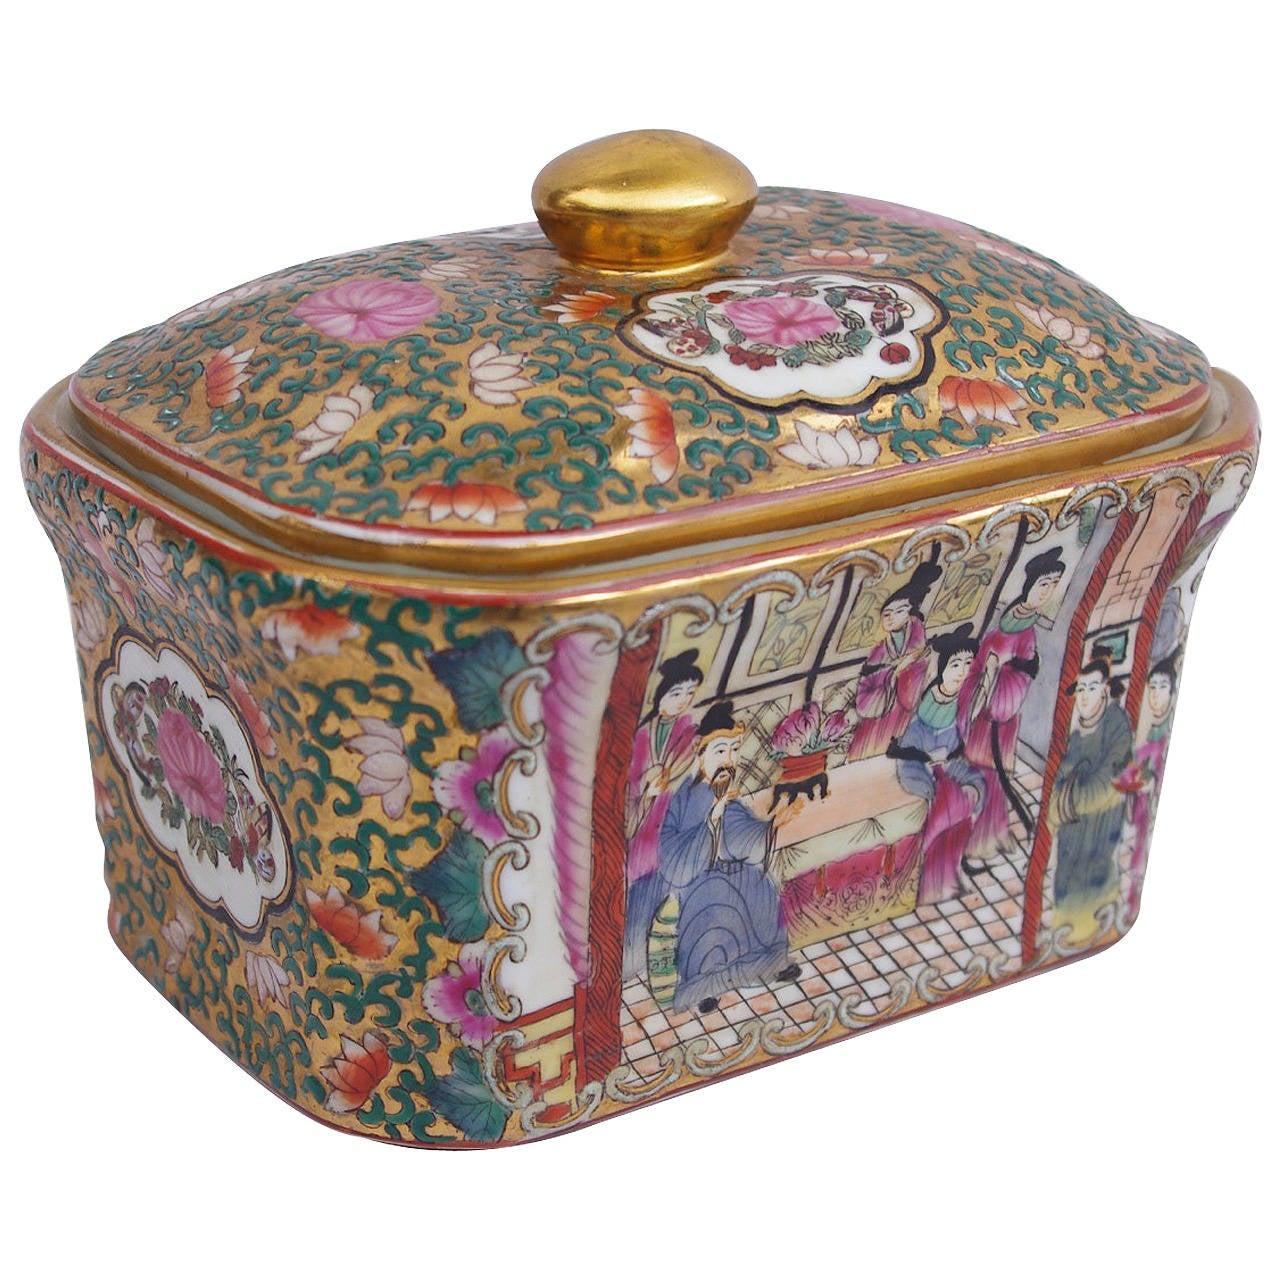 Covered Japanese Porcelain Box, circa 1900